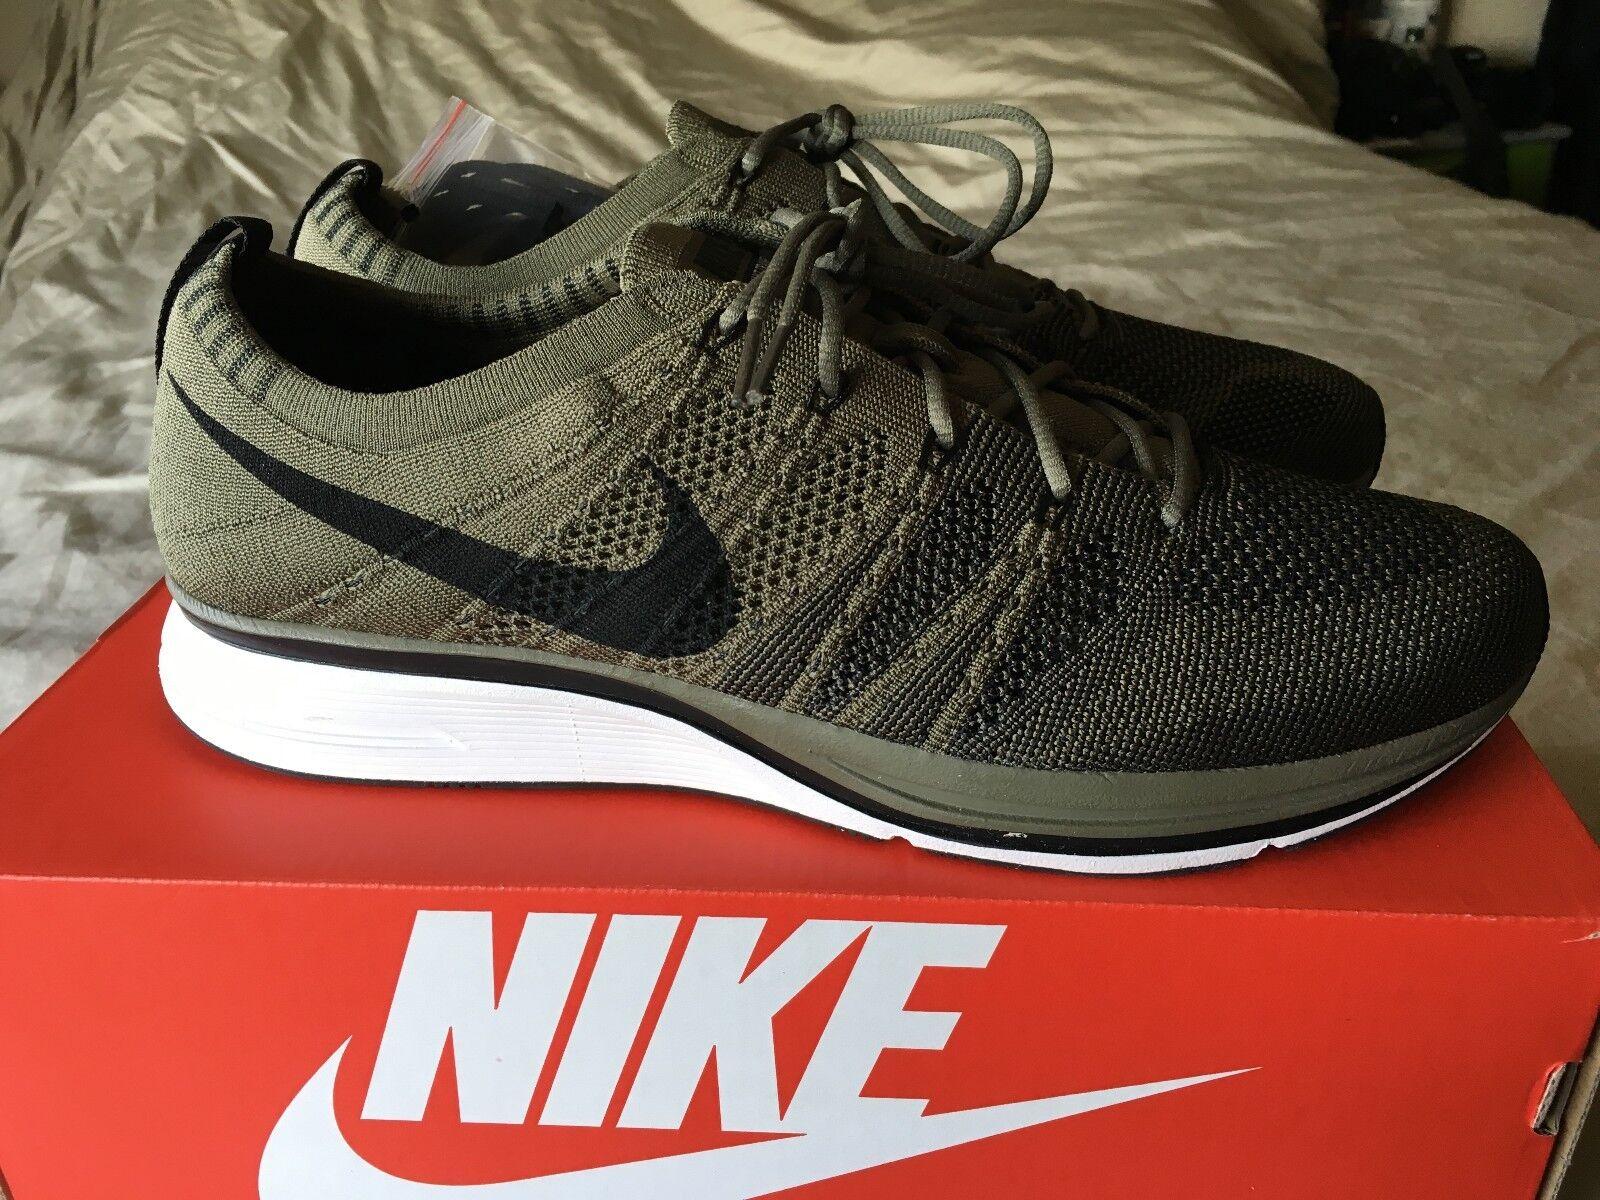 Nike Flyknit Trainer Running Medium Olive/Black/White AH8396-200 Mens SZ 11